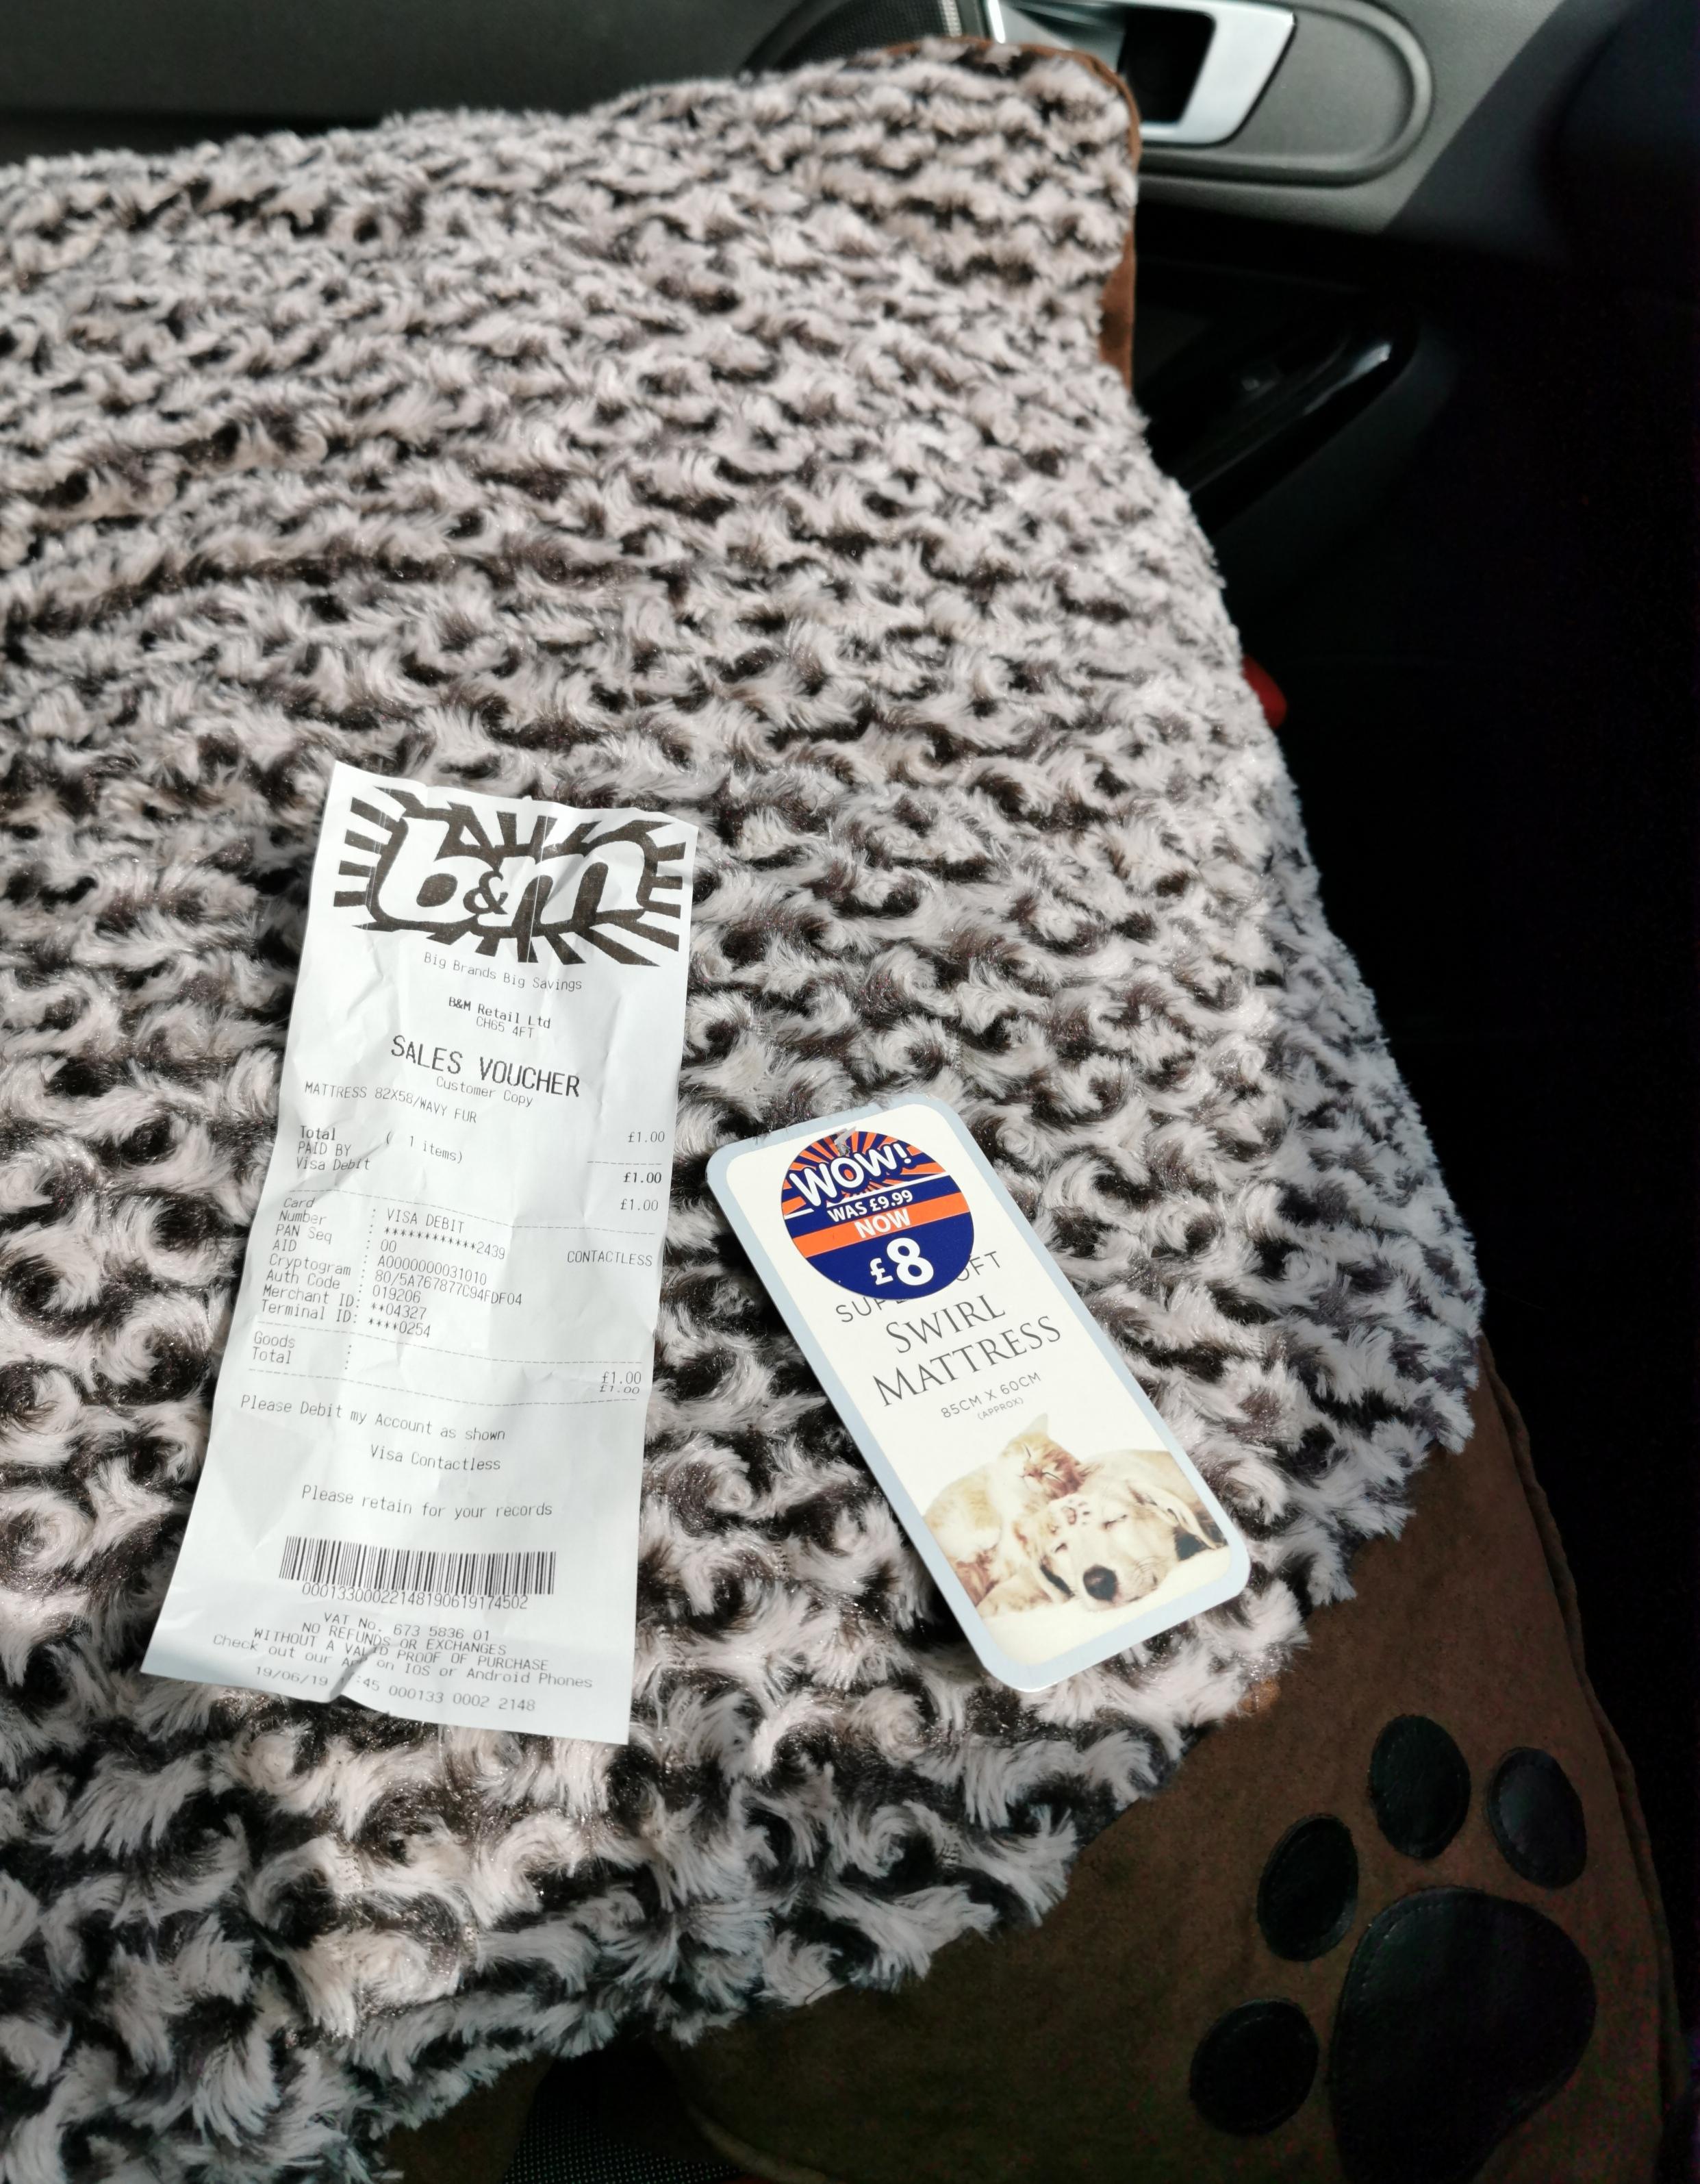 Super Soft Swirl Mattress Dog Bed £1 @ B&M